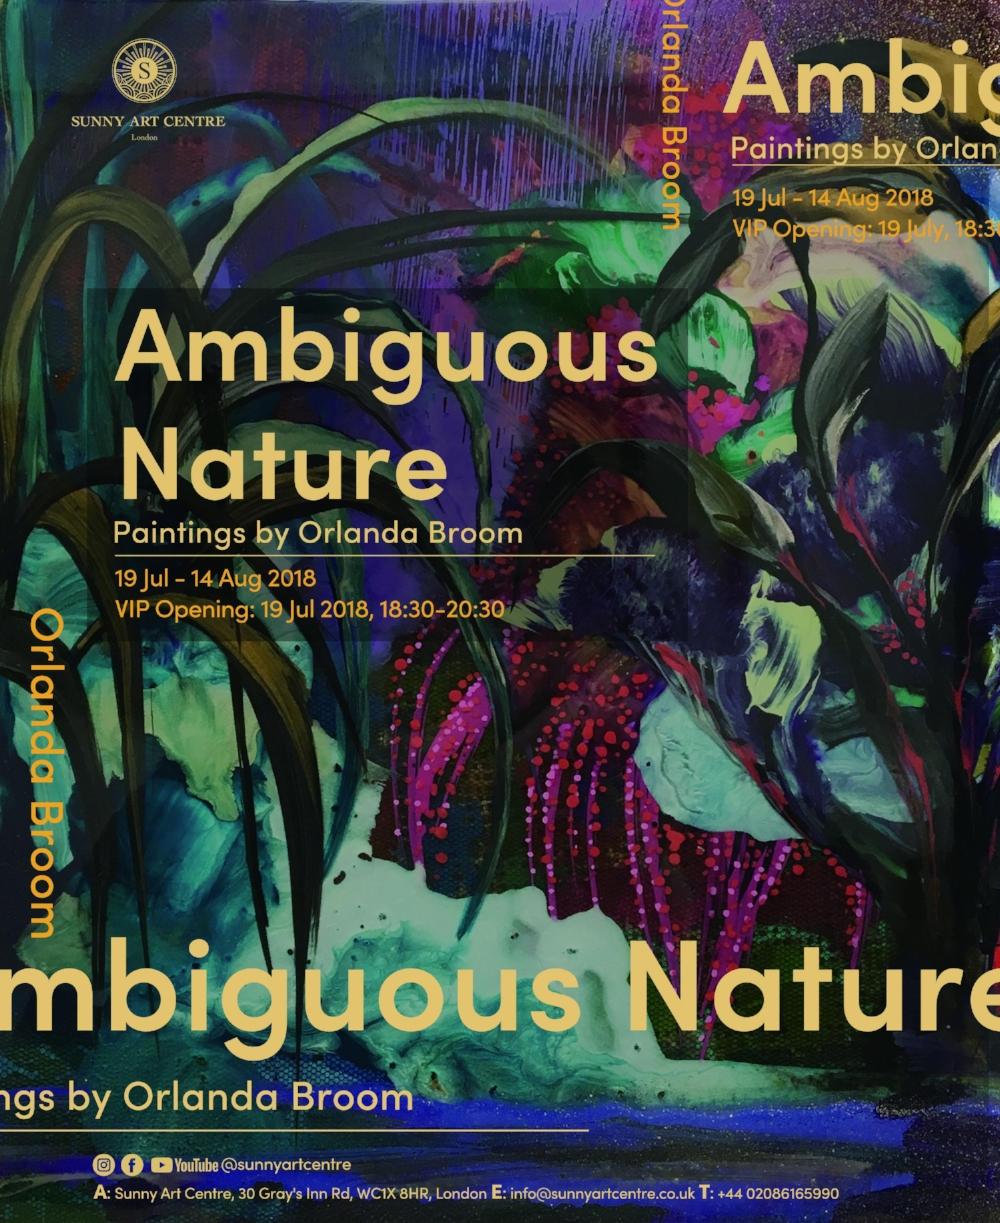 Ambiguous-Nature-Orlanda-Broom-poster-1.jpg